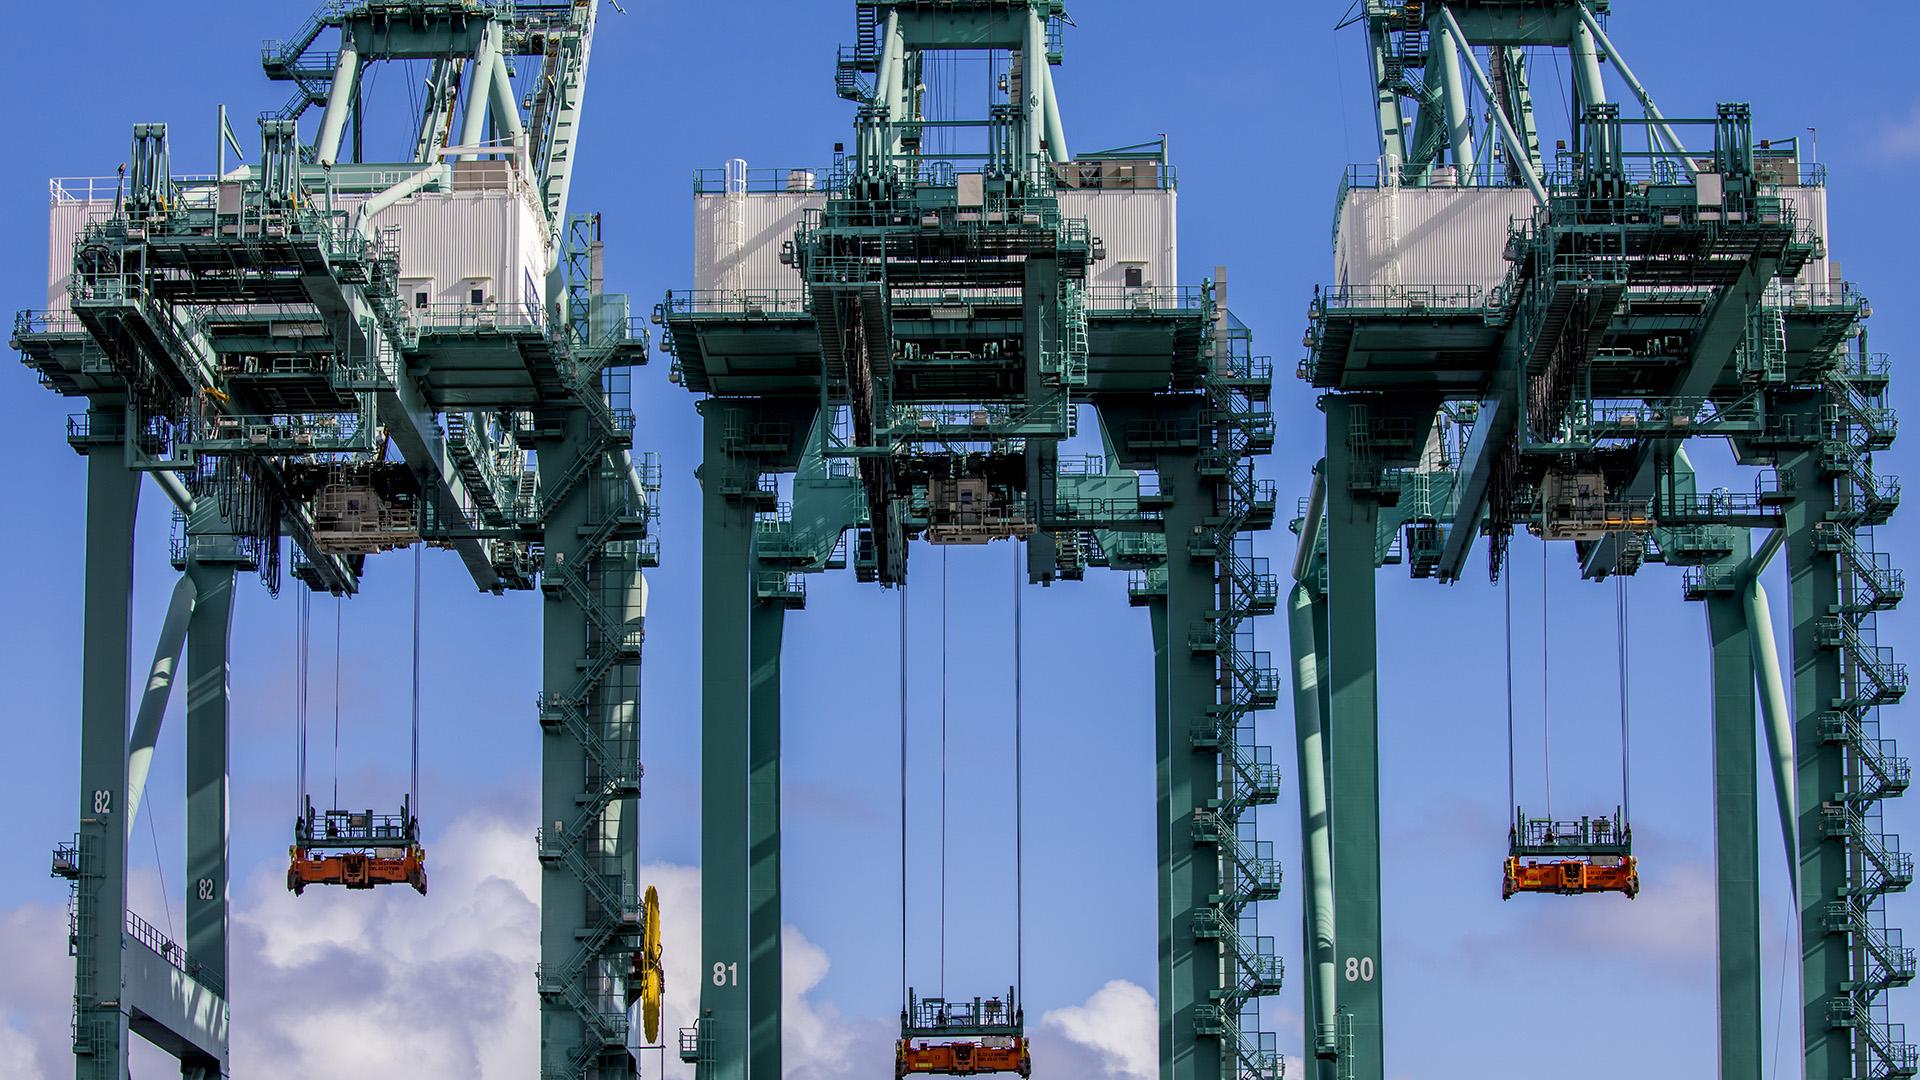 Cranes Against Clouds